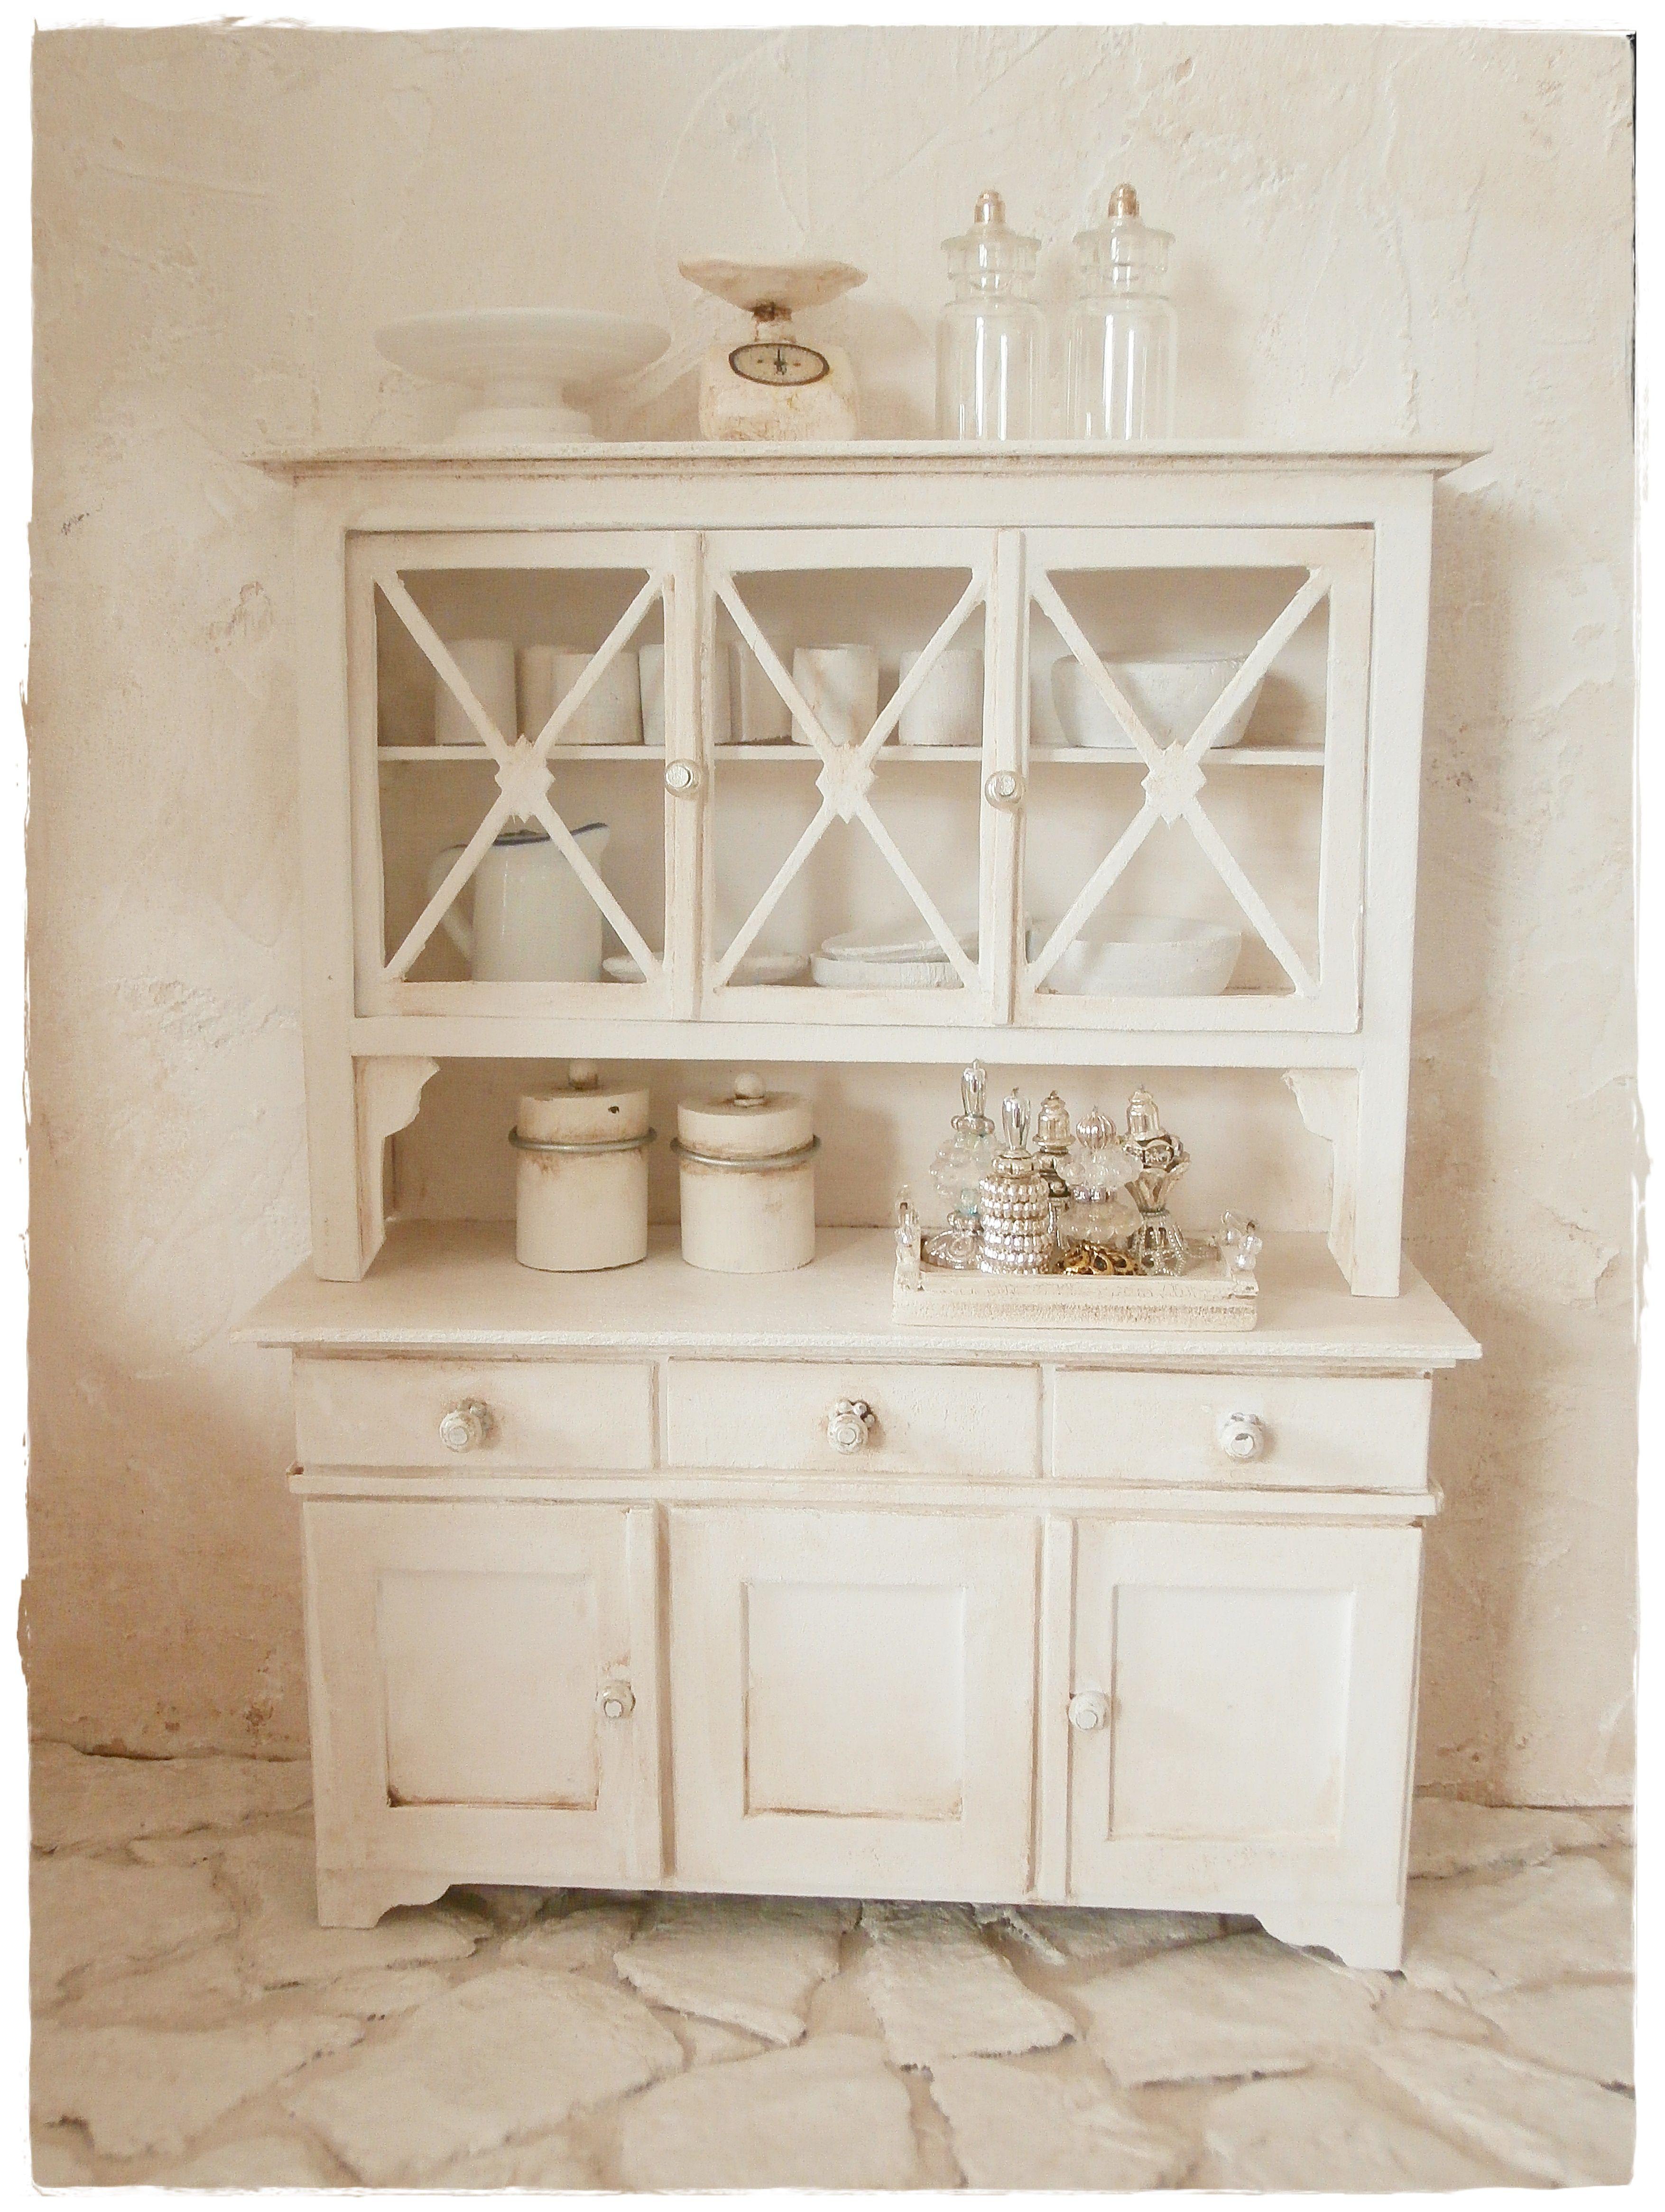 small furniture sigmine minis from shabbydollhouse pinterest miniatur m bel puppen und. Black Bedroom Furniture Sets. Home Design Ideas